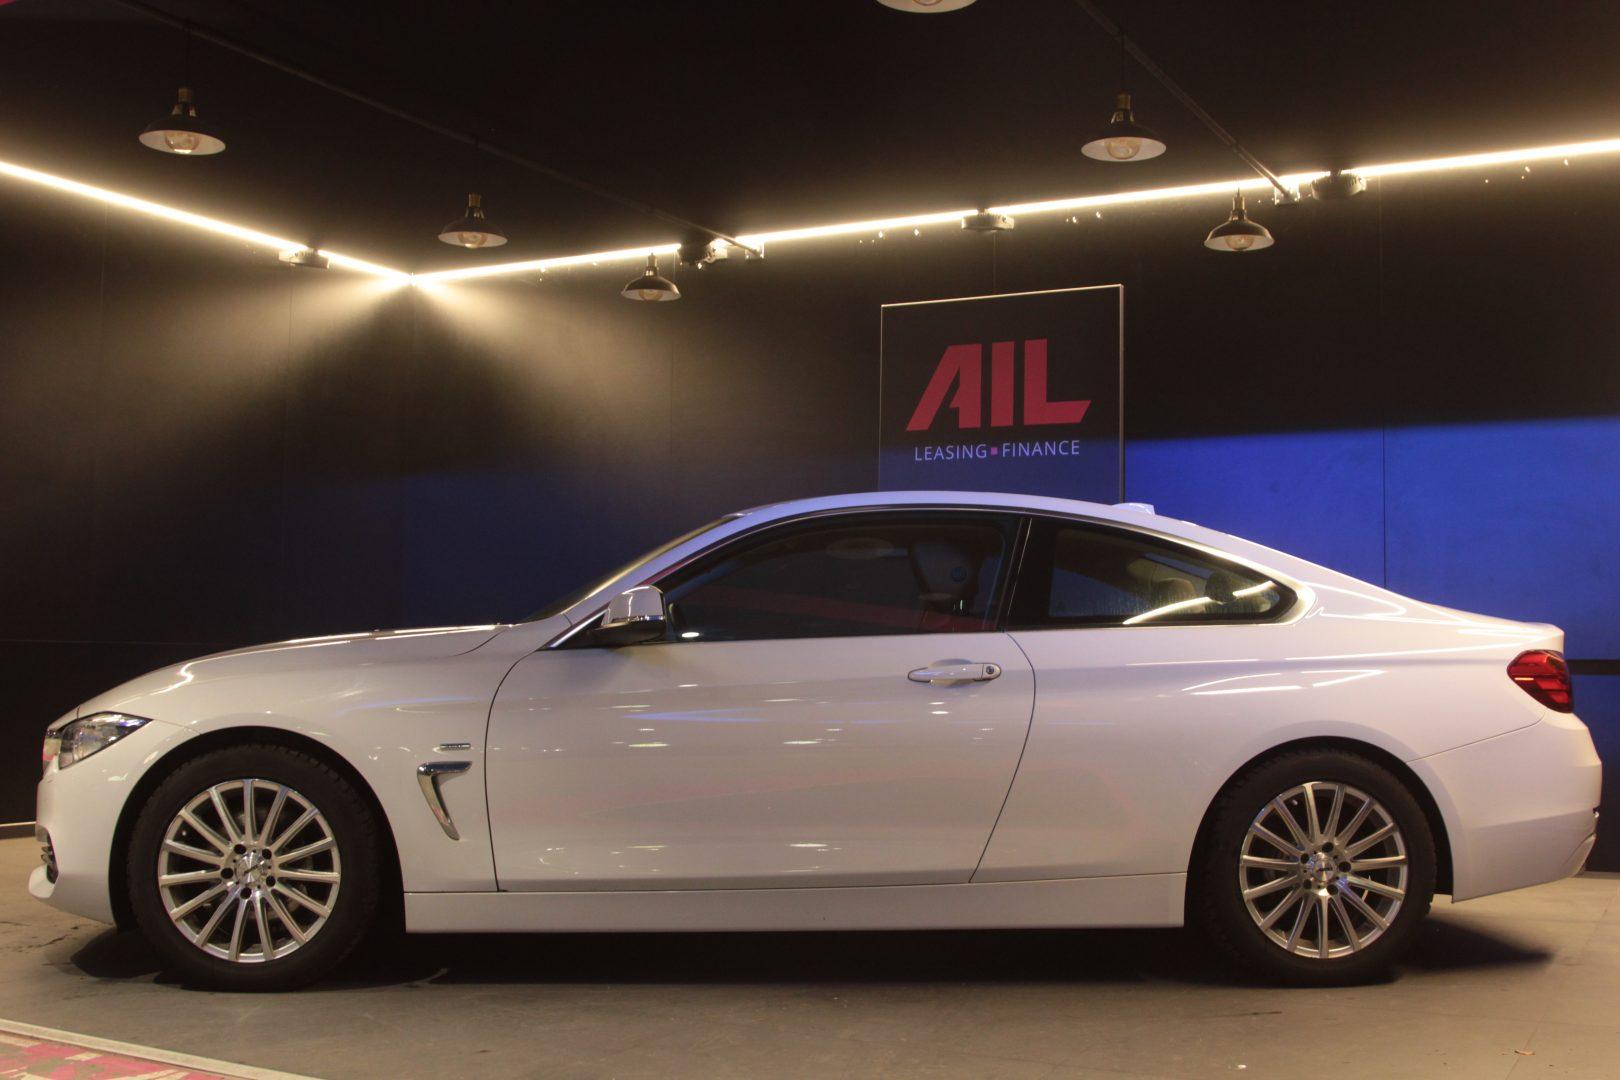 AIL BMW 430d 6